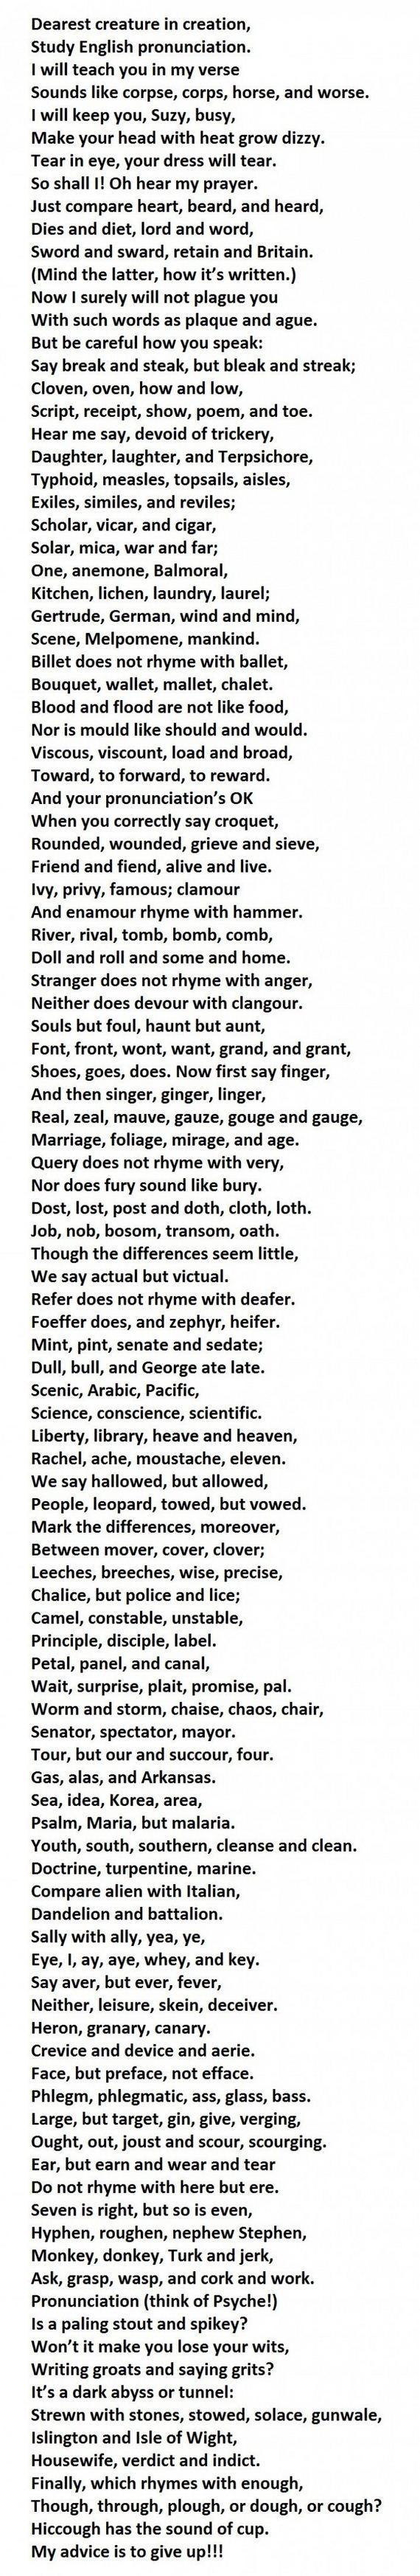 english-better